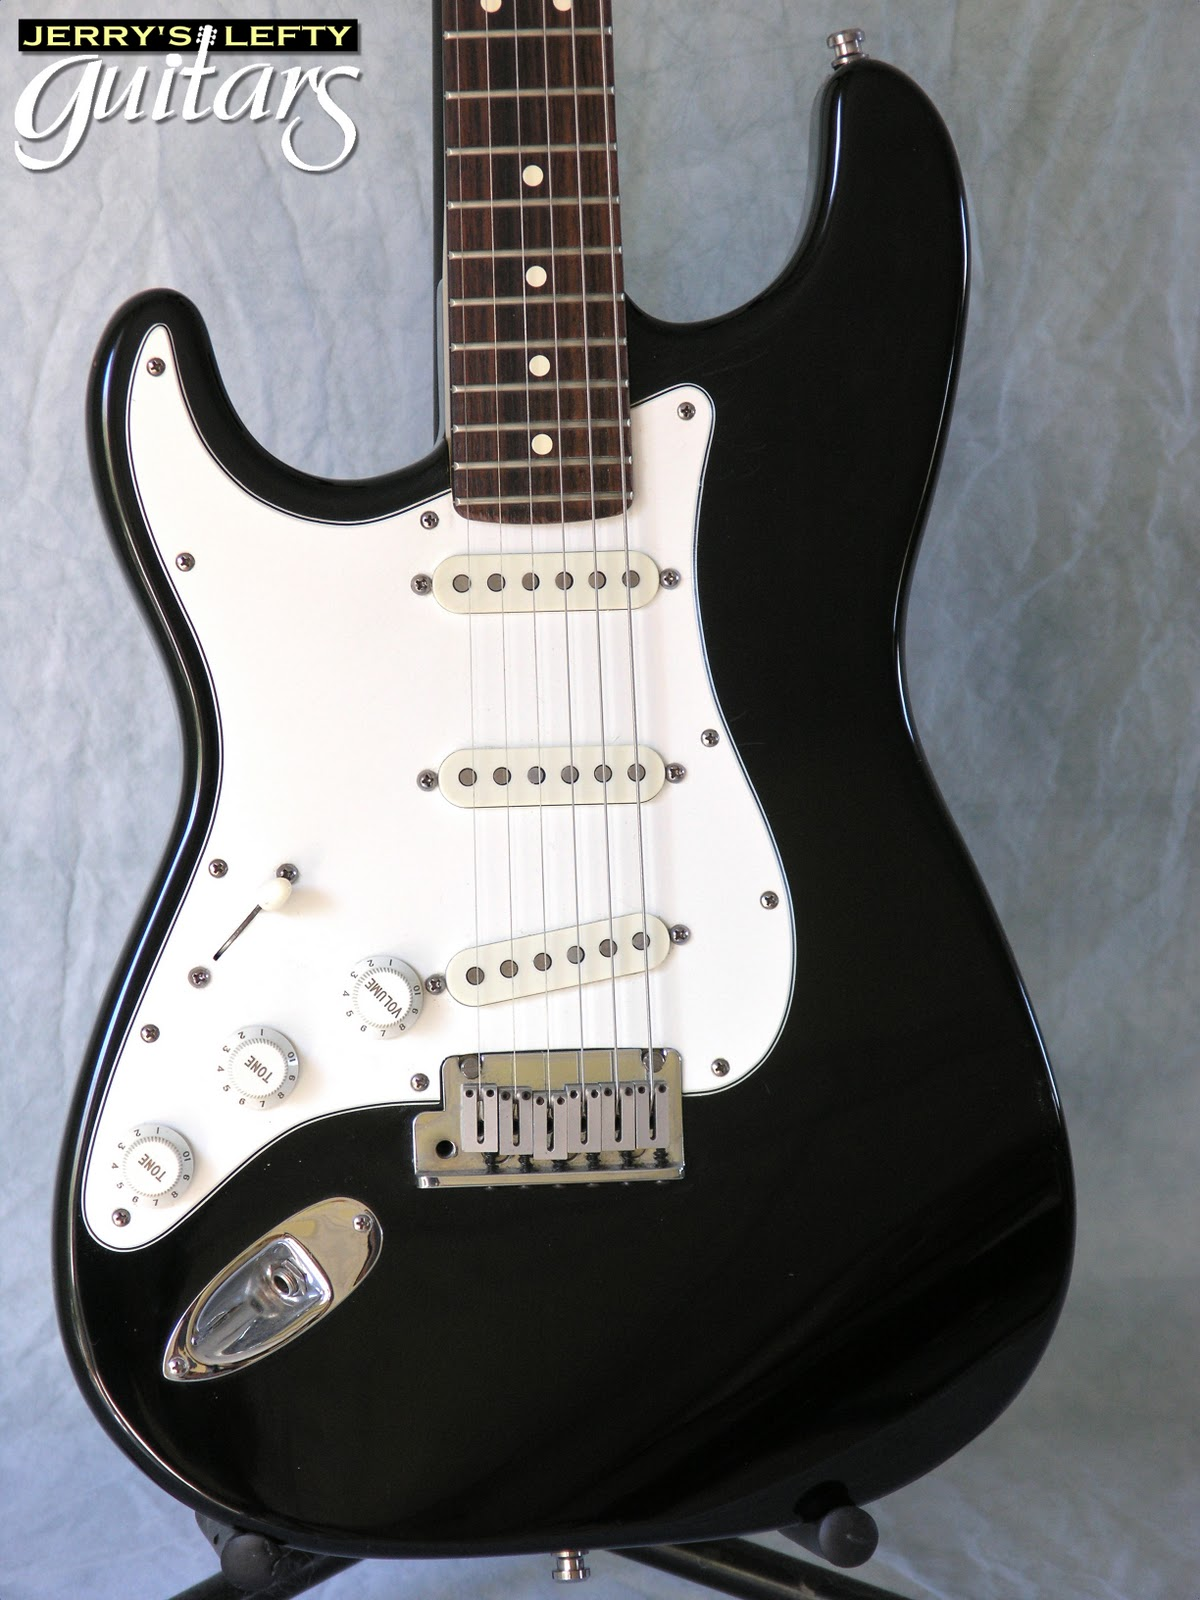 jerry 39 s lefty guitars newest guitar arrivals updated weekly fender standard strat 1990 usa. Black Bedroom Furniture Sets. Home Design Ideas